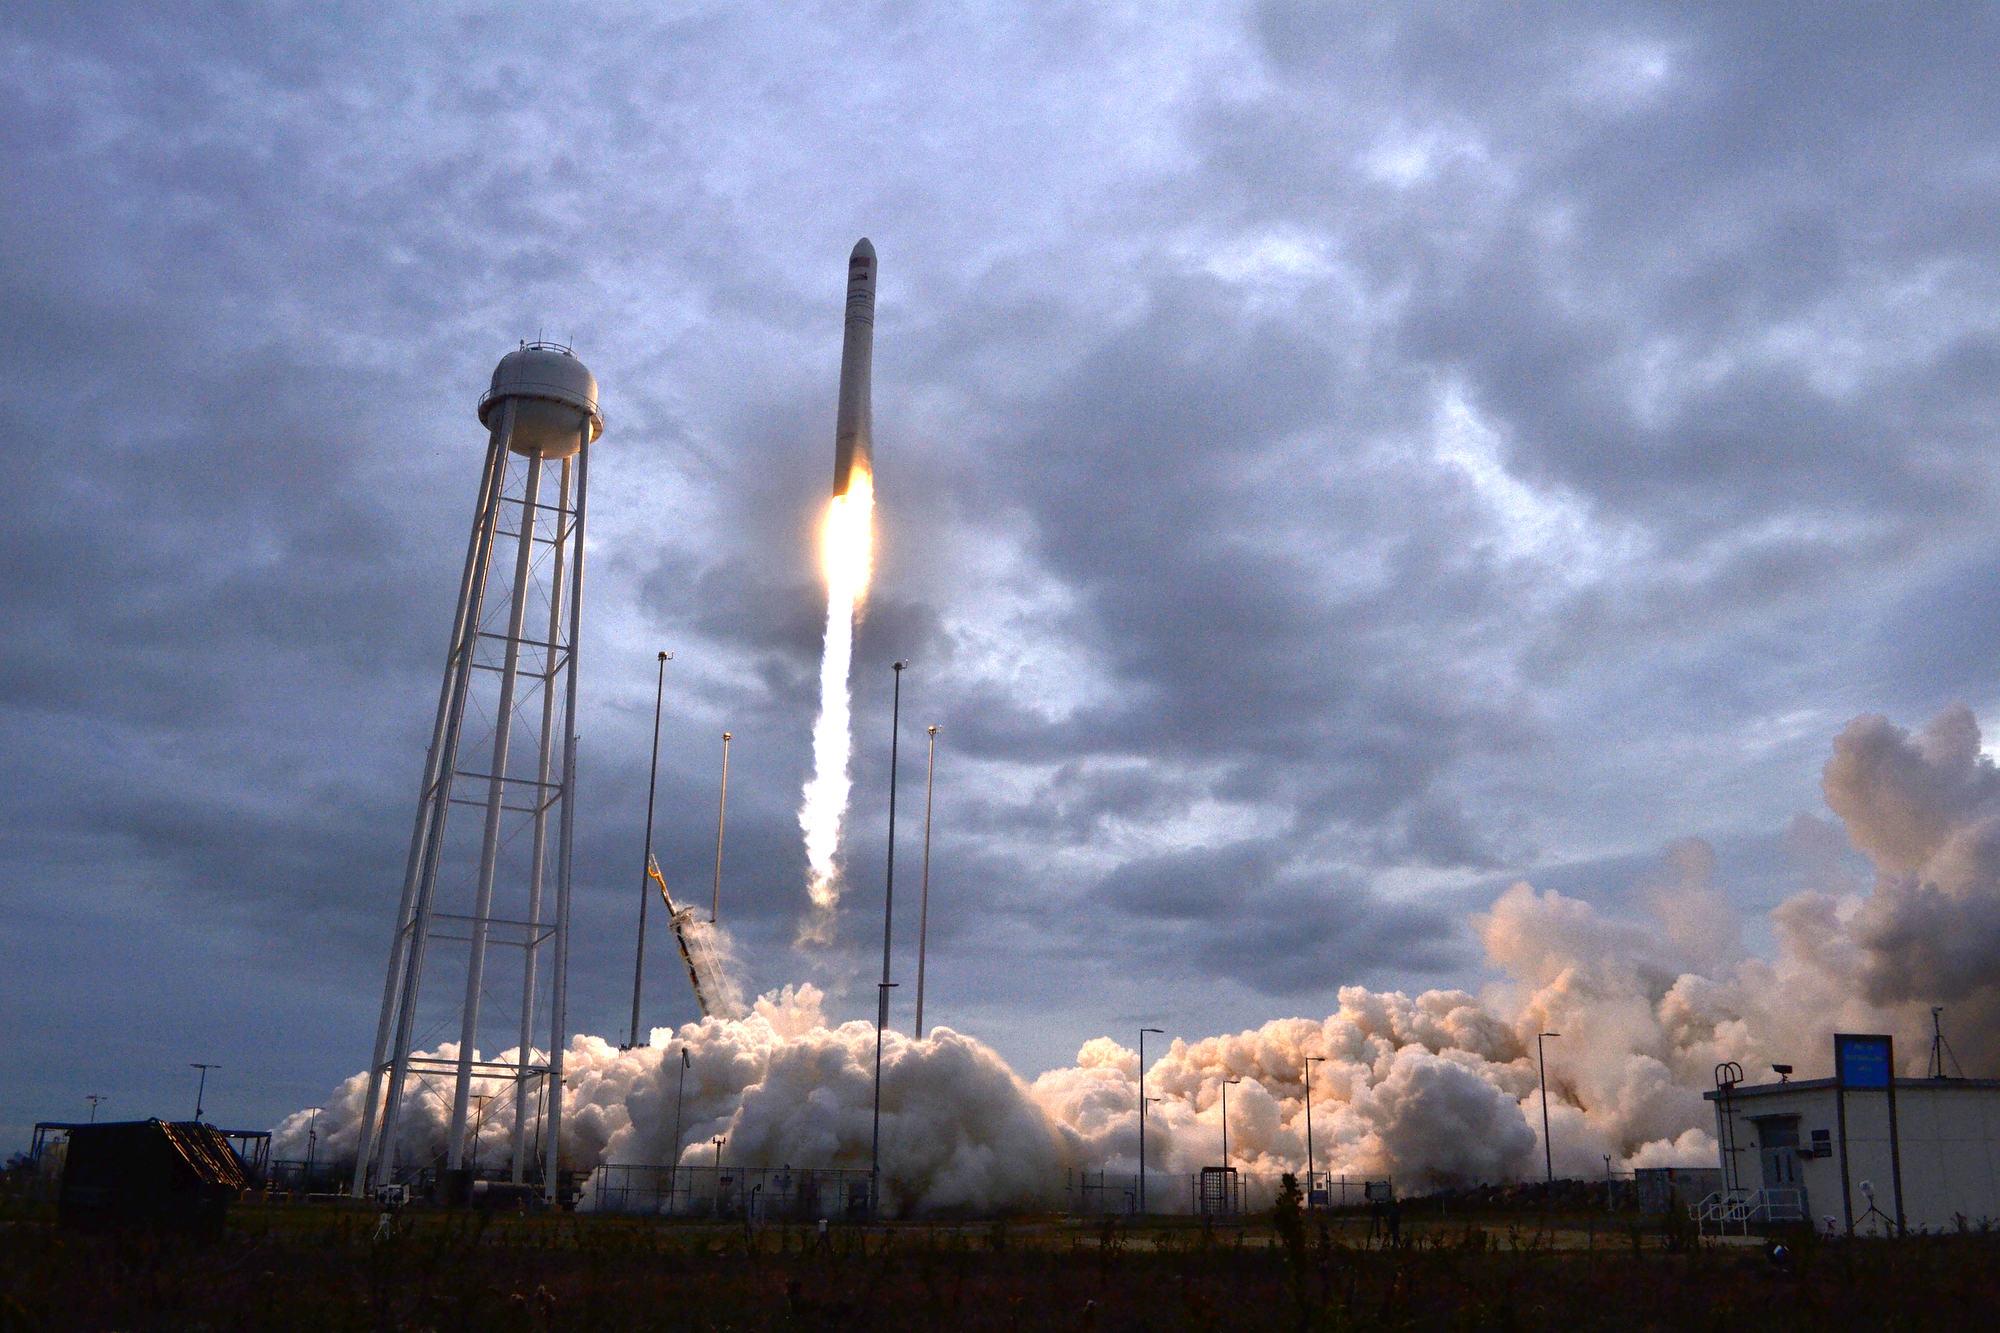 Photographing an Antares rocket launch at Wallops Island